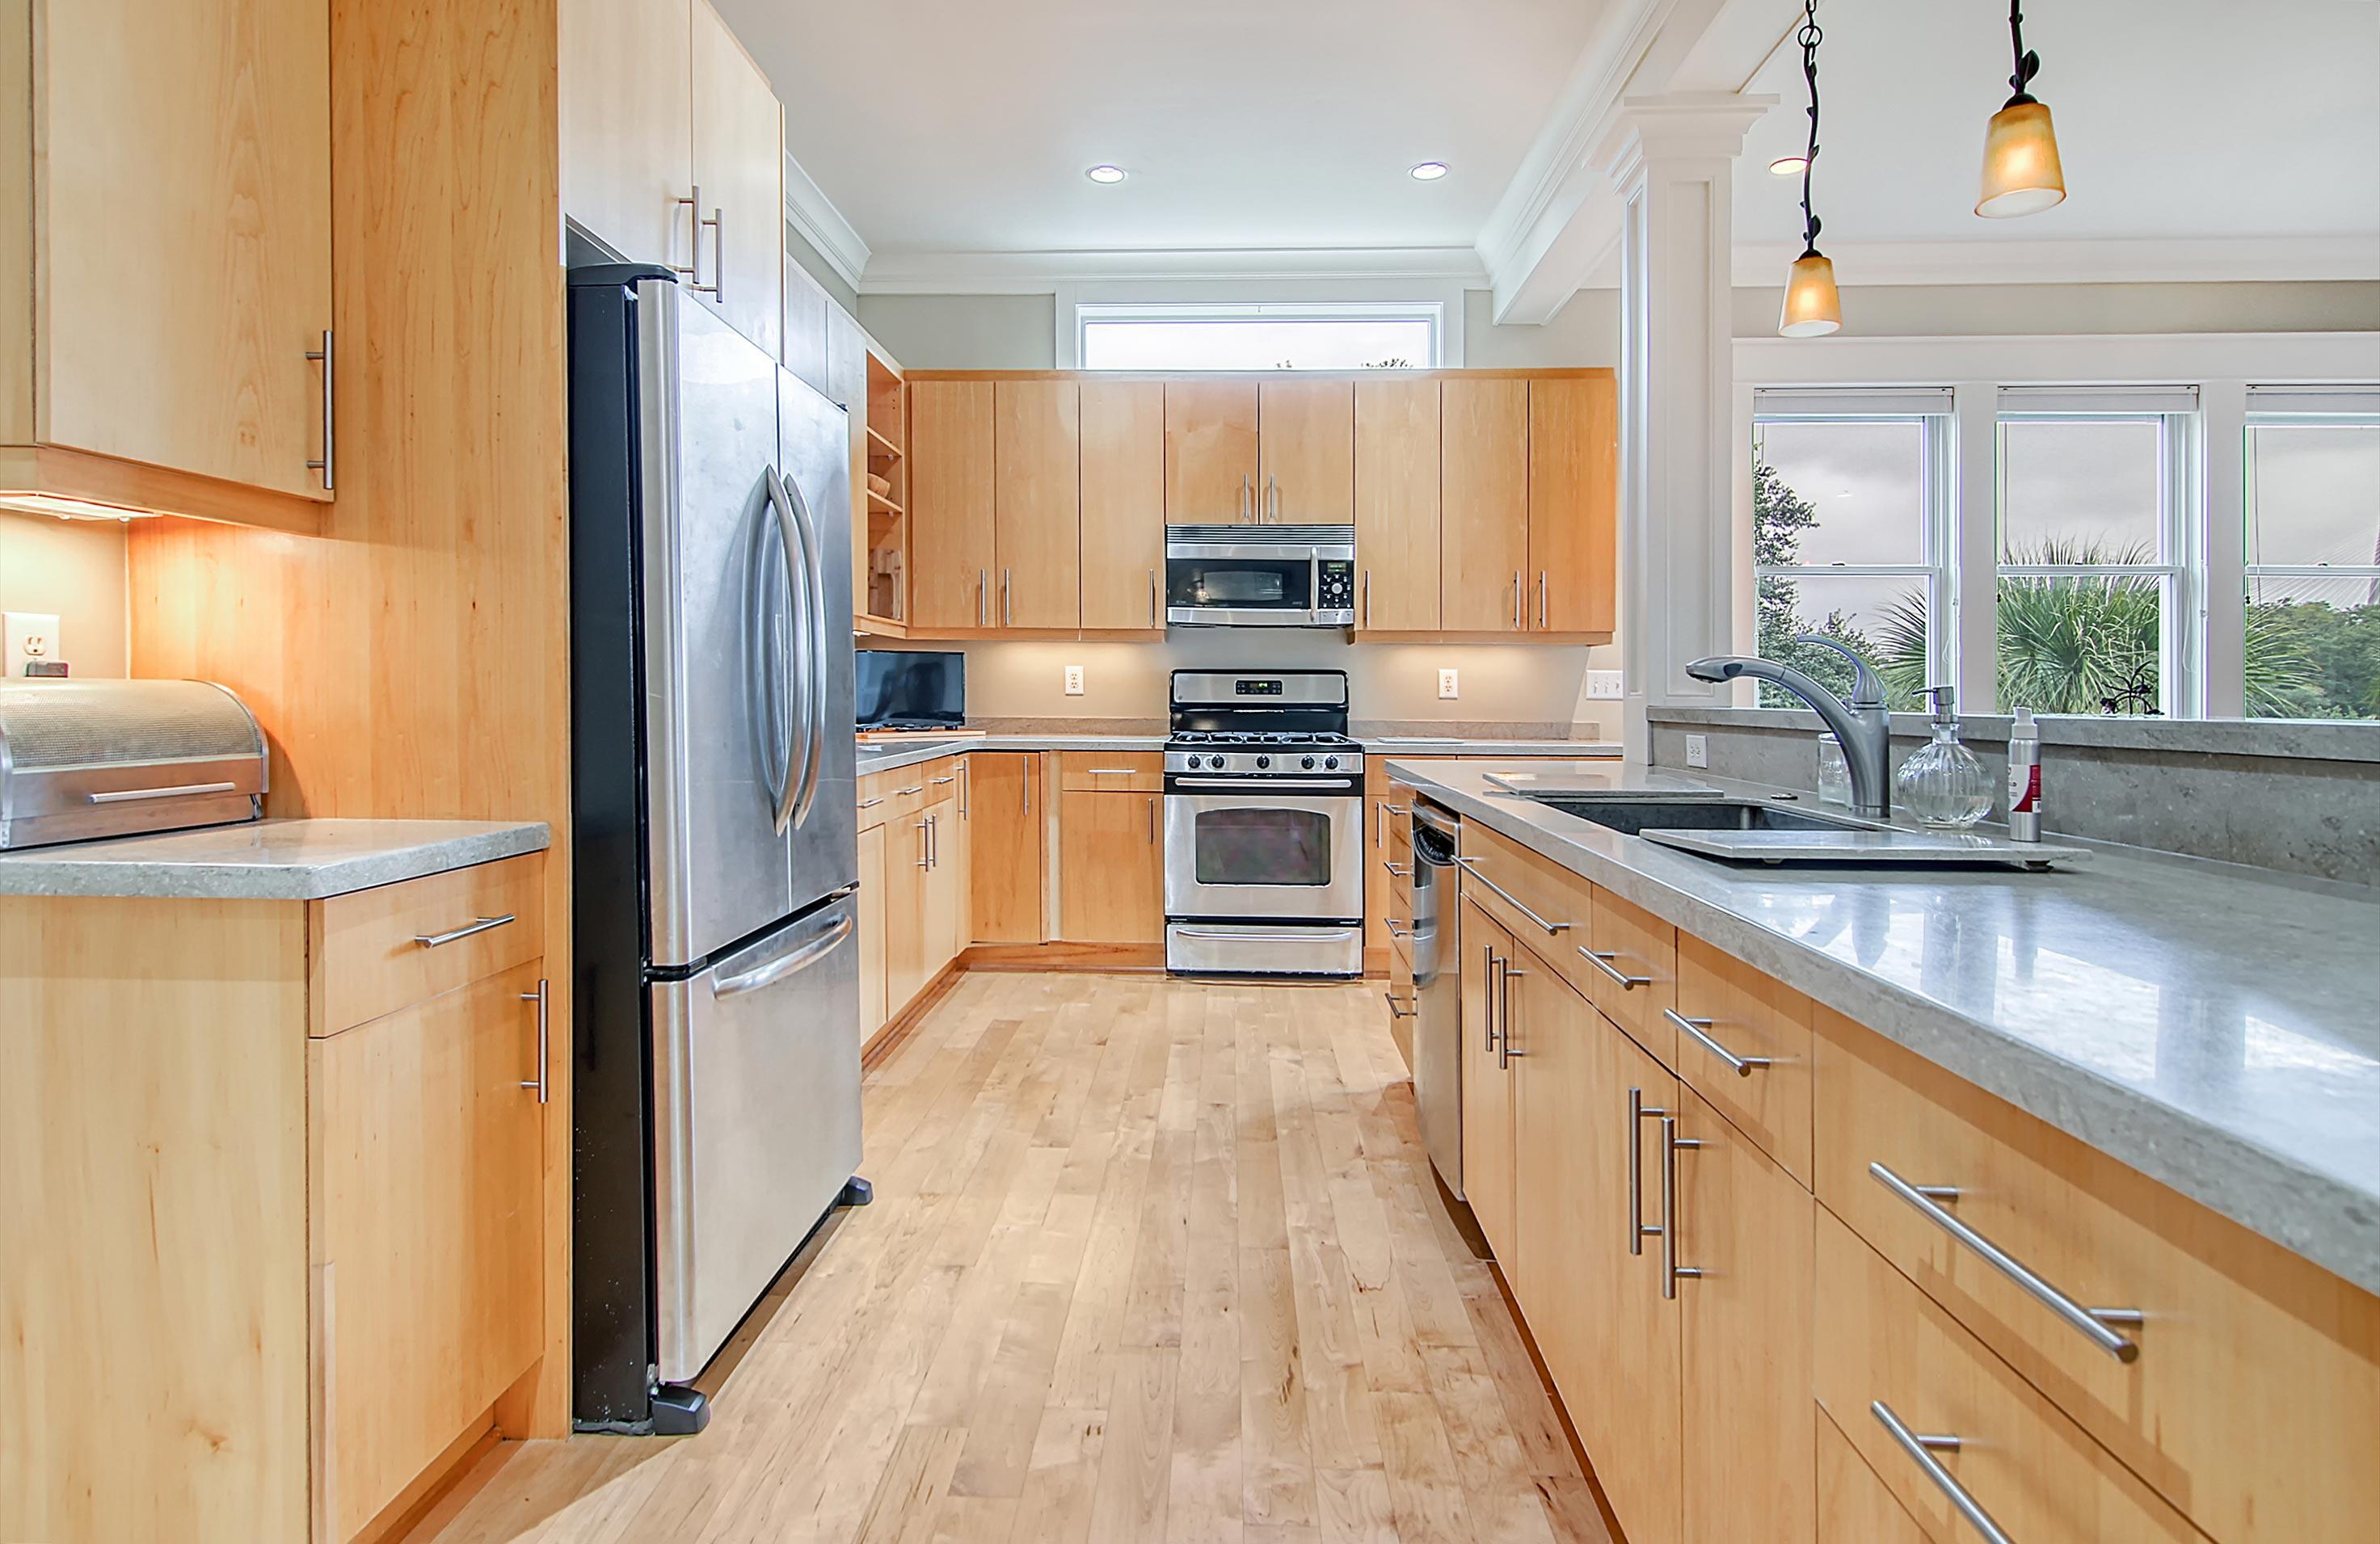 Scanlonville Homes For Sale - 152 6th, Mount Pleasant, SC - 2